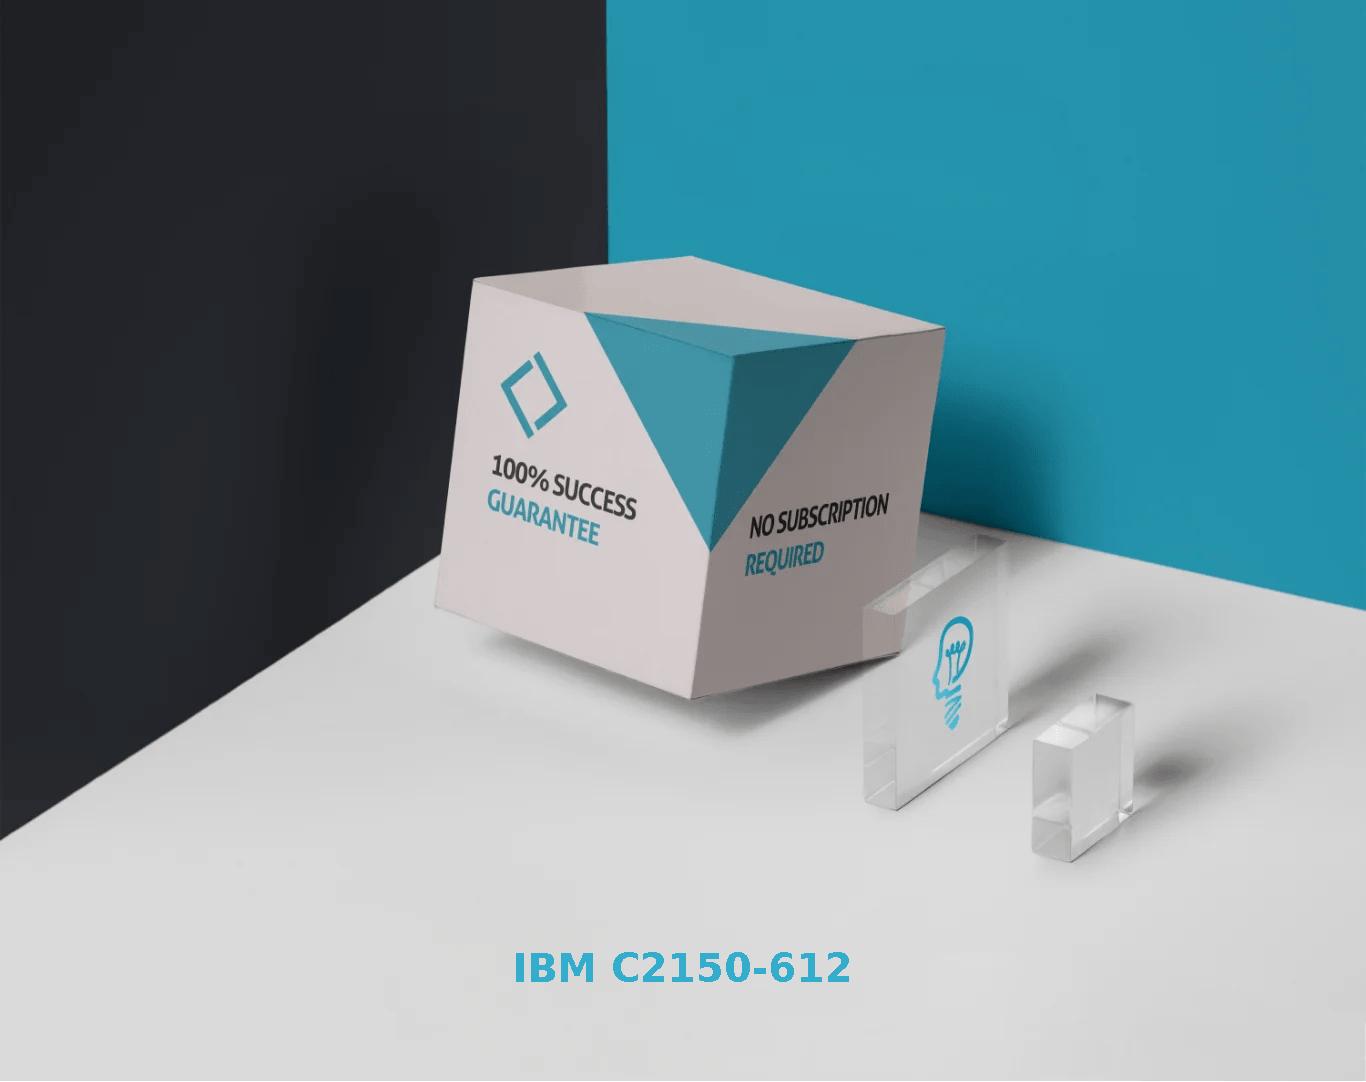 IBM C2150-612 Exams